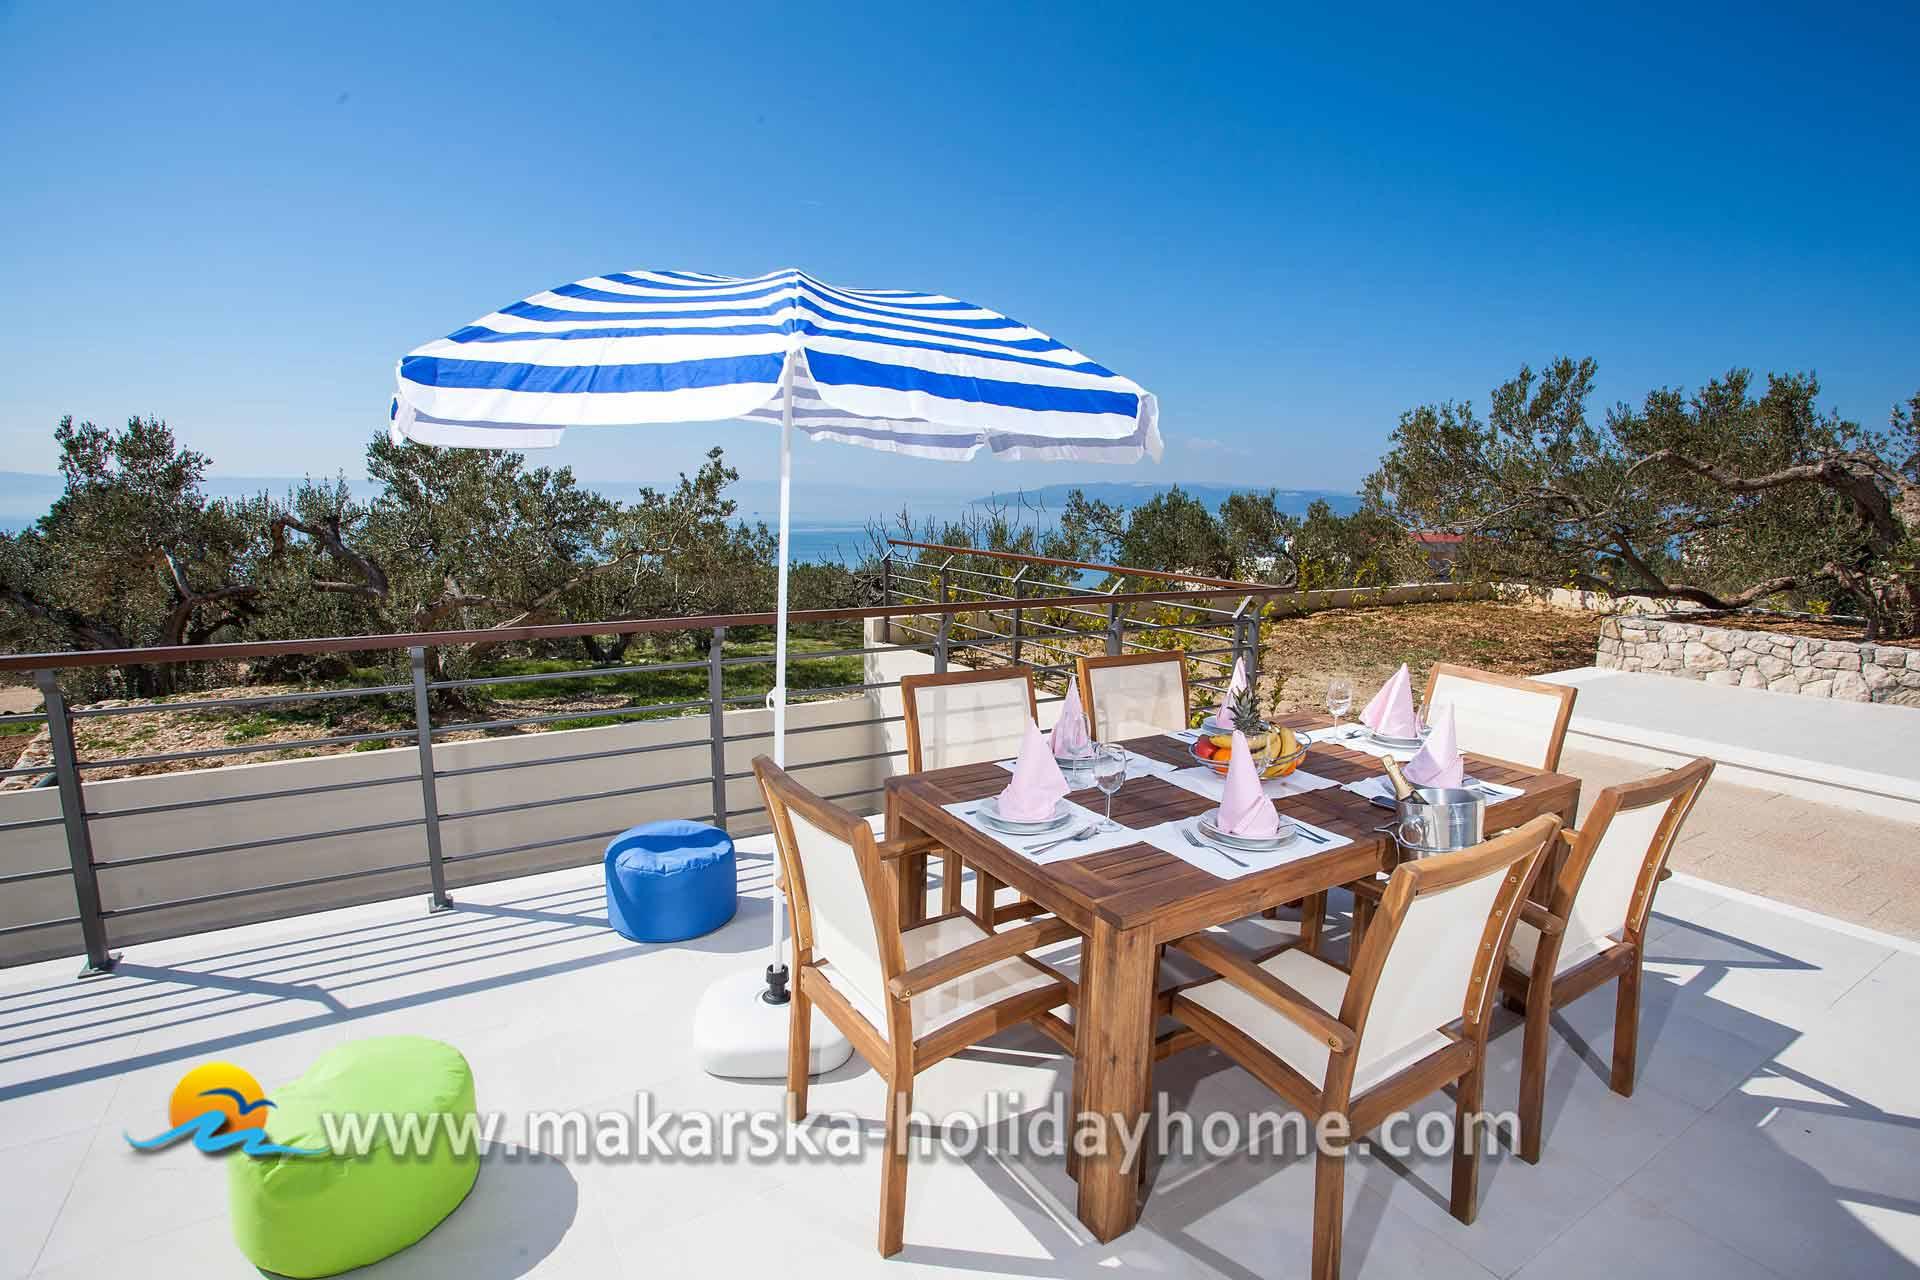 Ferienhaus kroatien mit privatem pool makarska villa silva for Kroatien villa mit pool